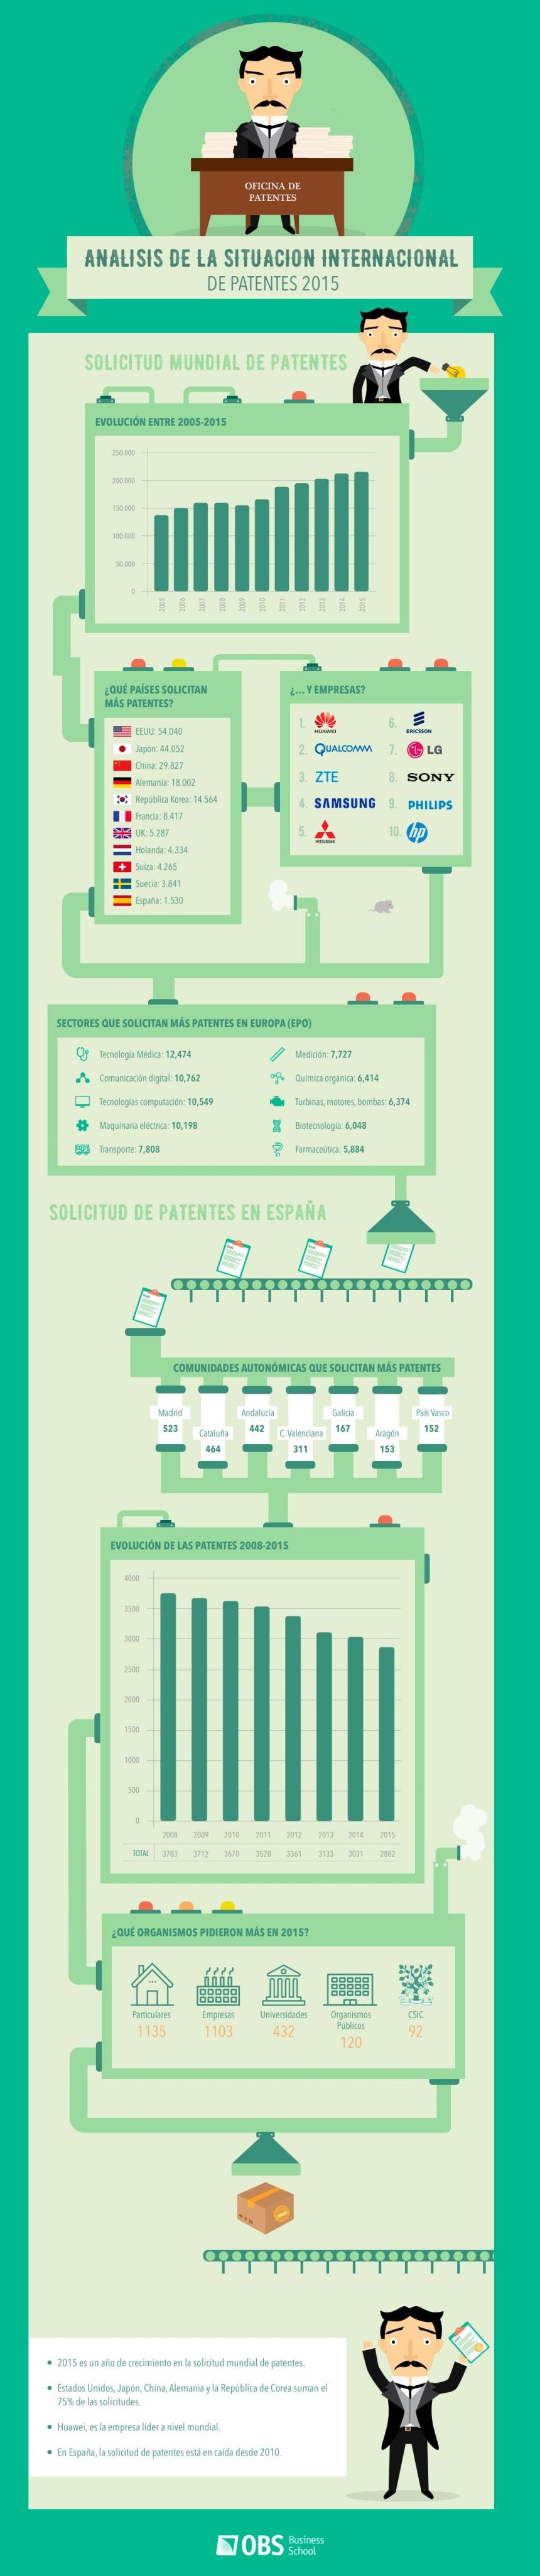 patentes-2015-infografia